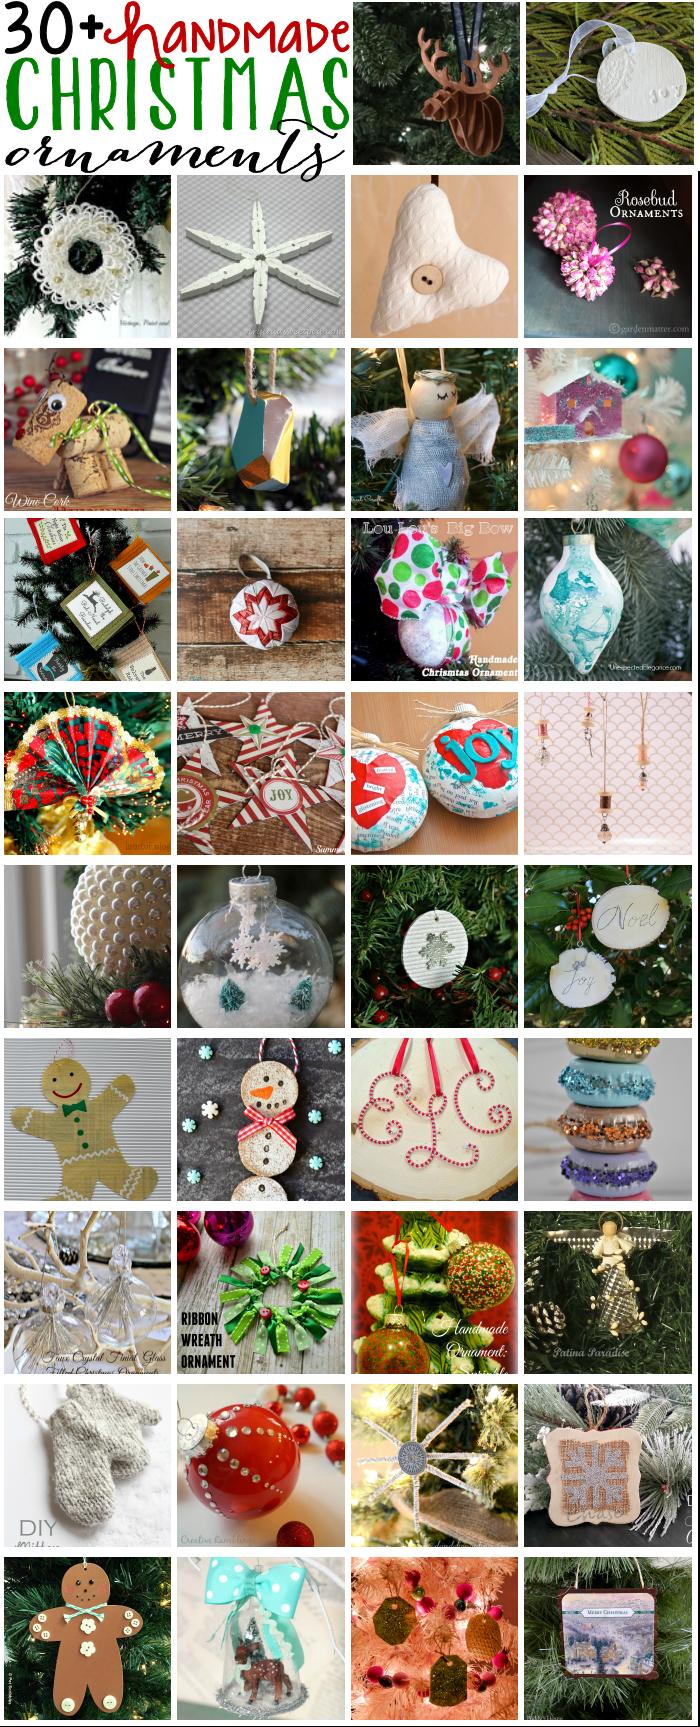 Handmade Christms Ornaments Blog Hop